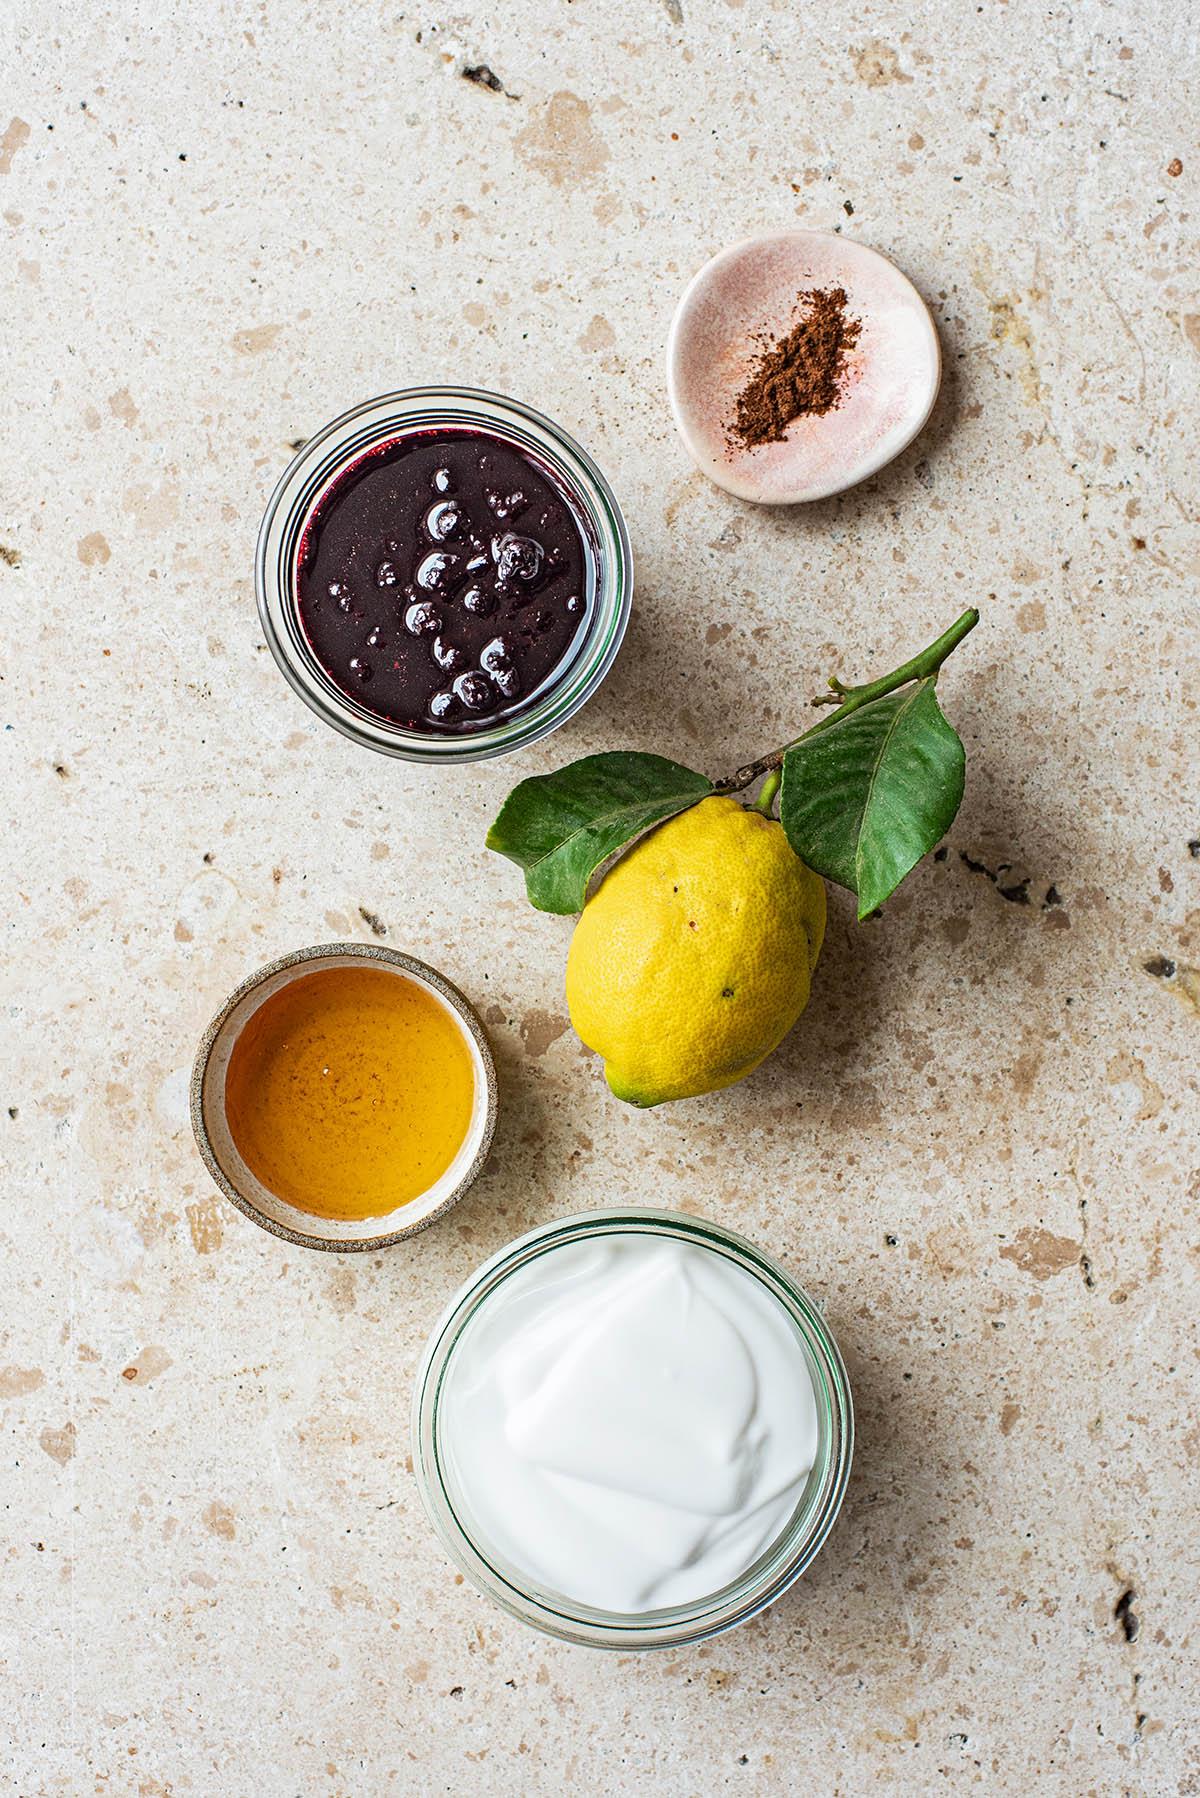 Creamy Lemon Blueberry Popsicle ingredients.